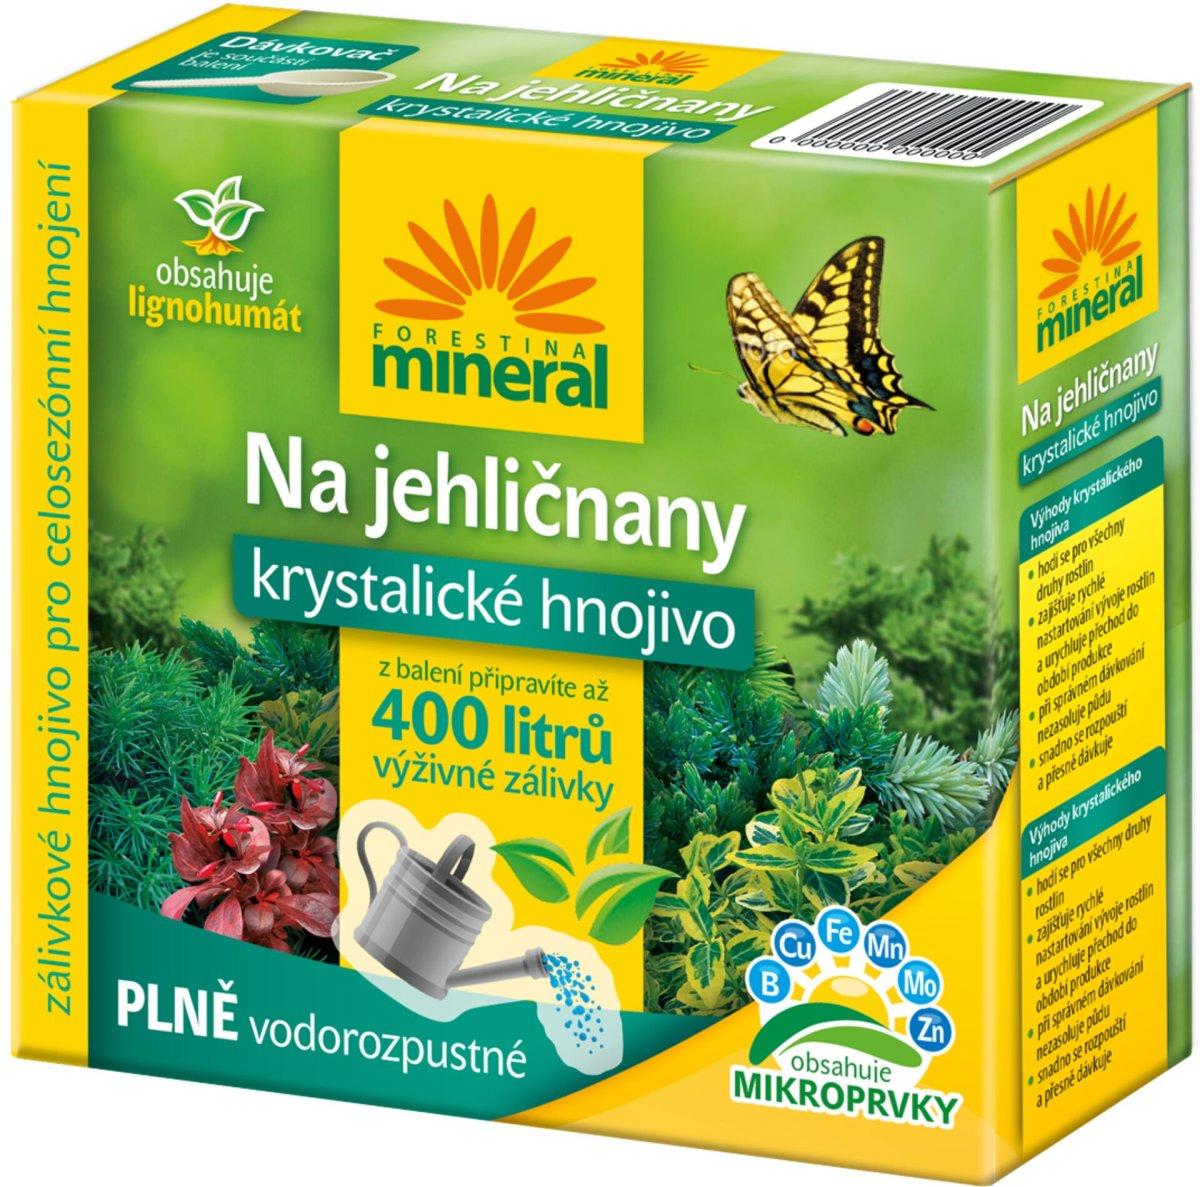 Krystalické hnojivo s lignohumátem - Na jehličnany a okr. keře 400 g